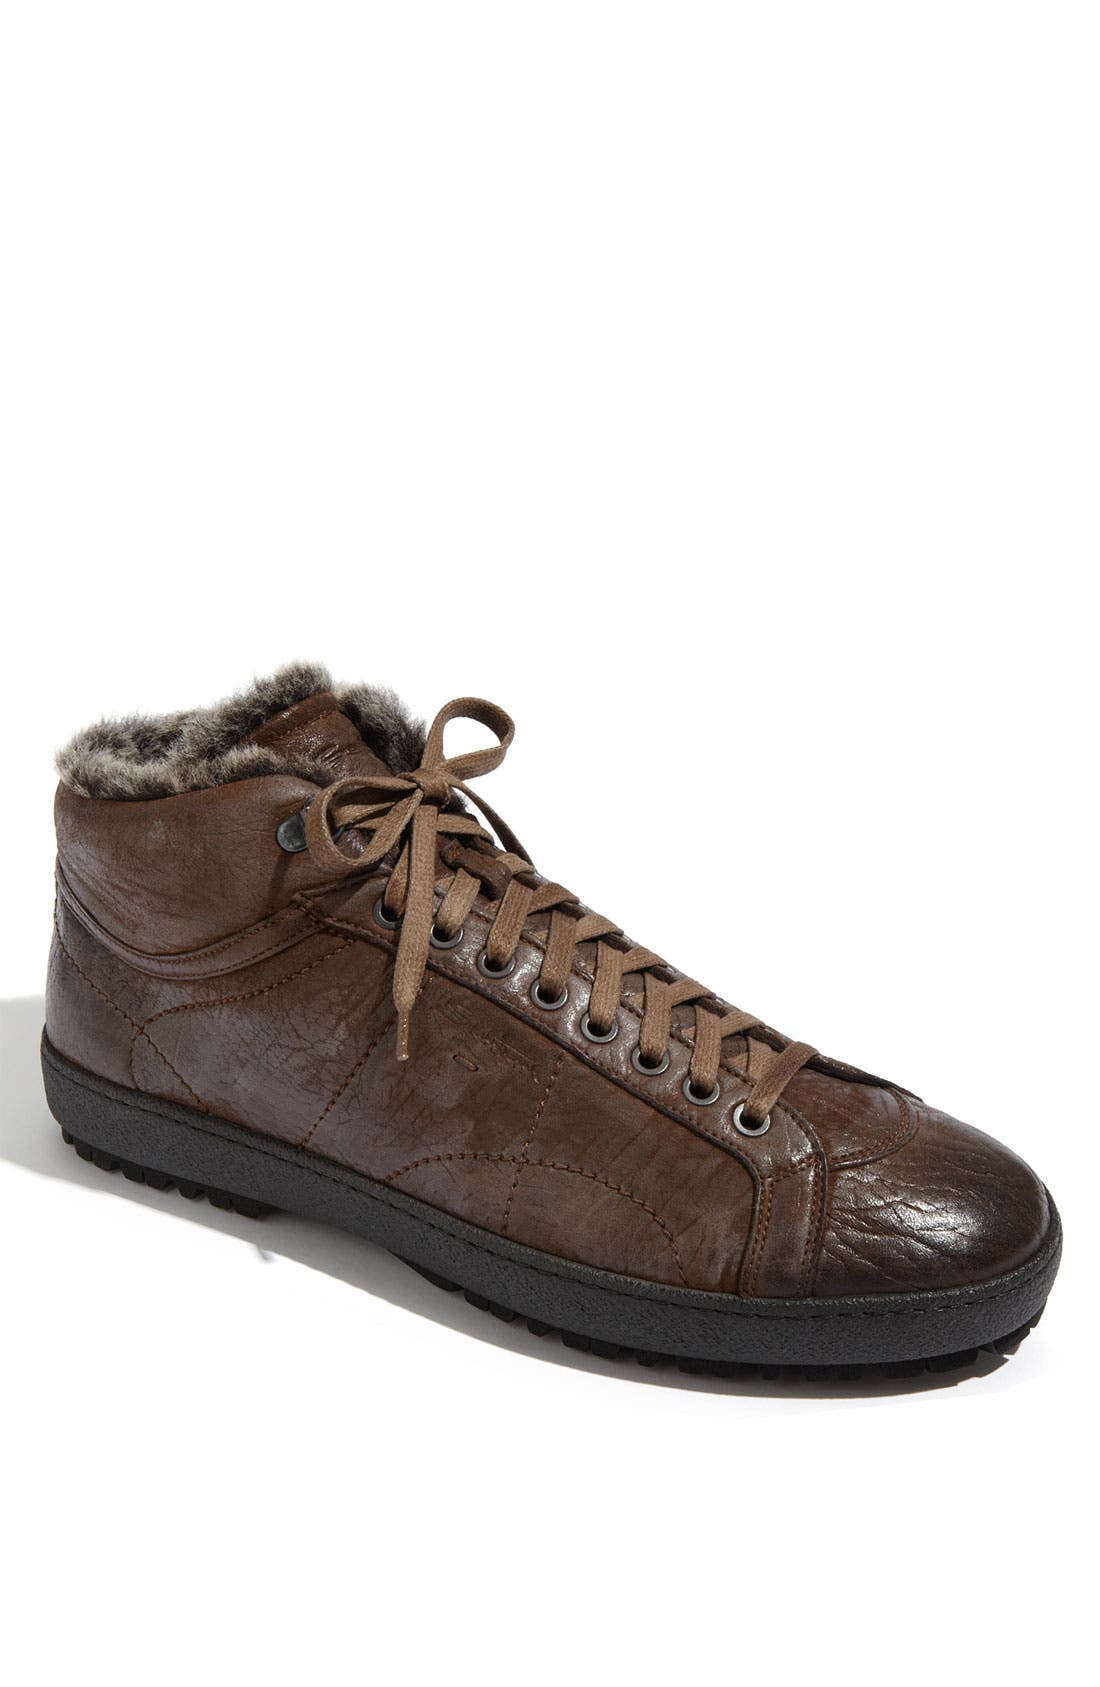 Main Image - Santoni 'Dorado' Shearling Trimmed Sneaker